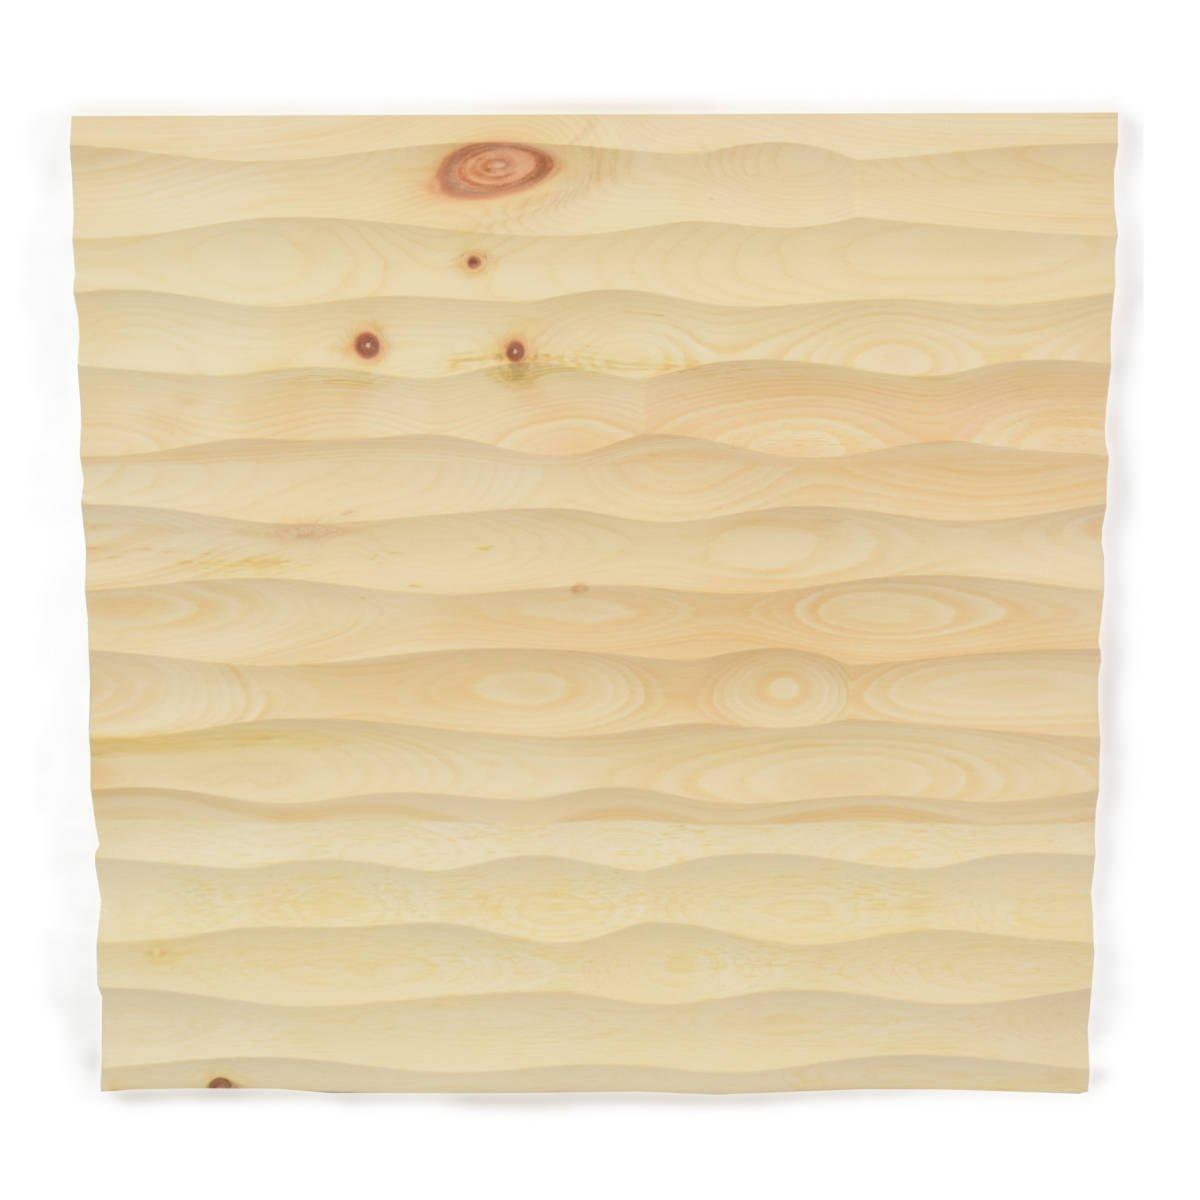 4betterdays Wandverkleidung aus Zirbenholz 33x33x2,8 cm (LxBxT) echte Handarbeit aus Südtirol